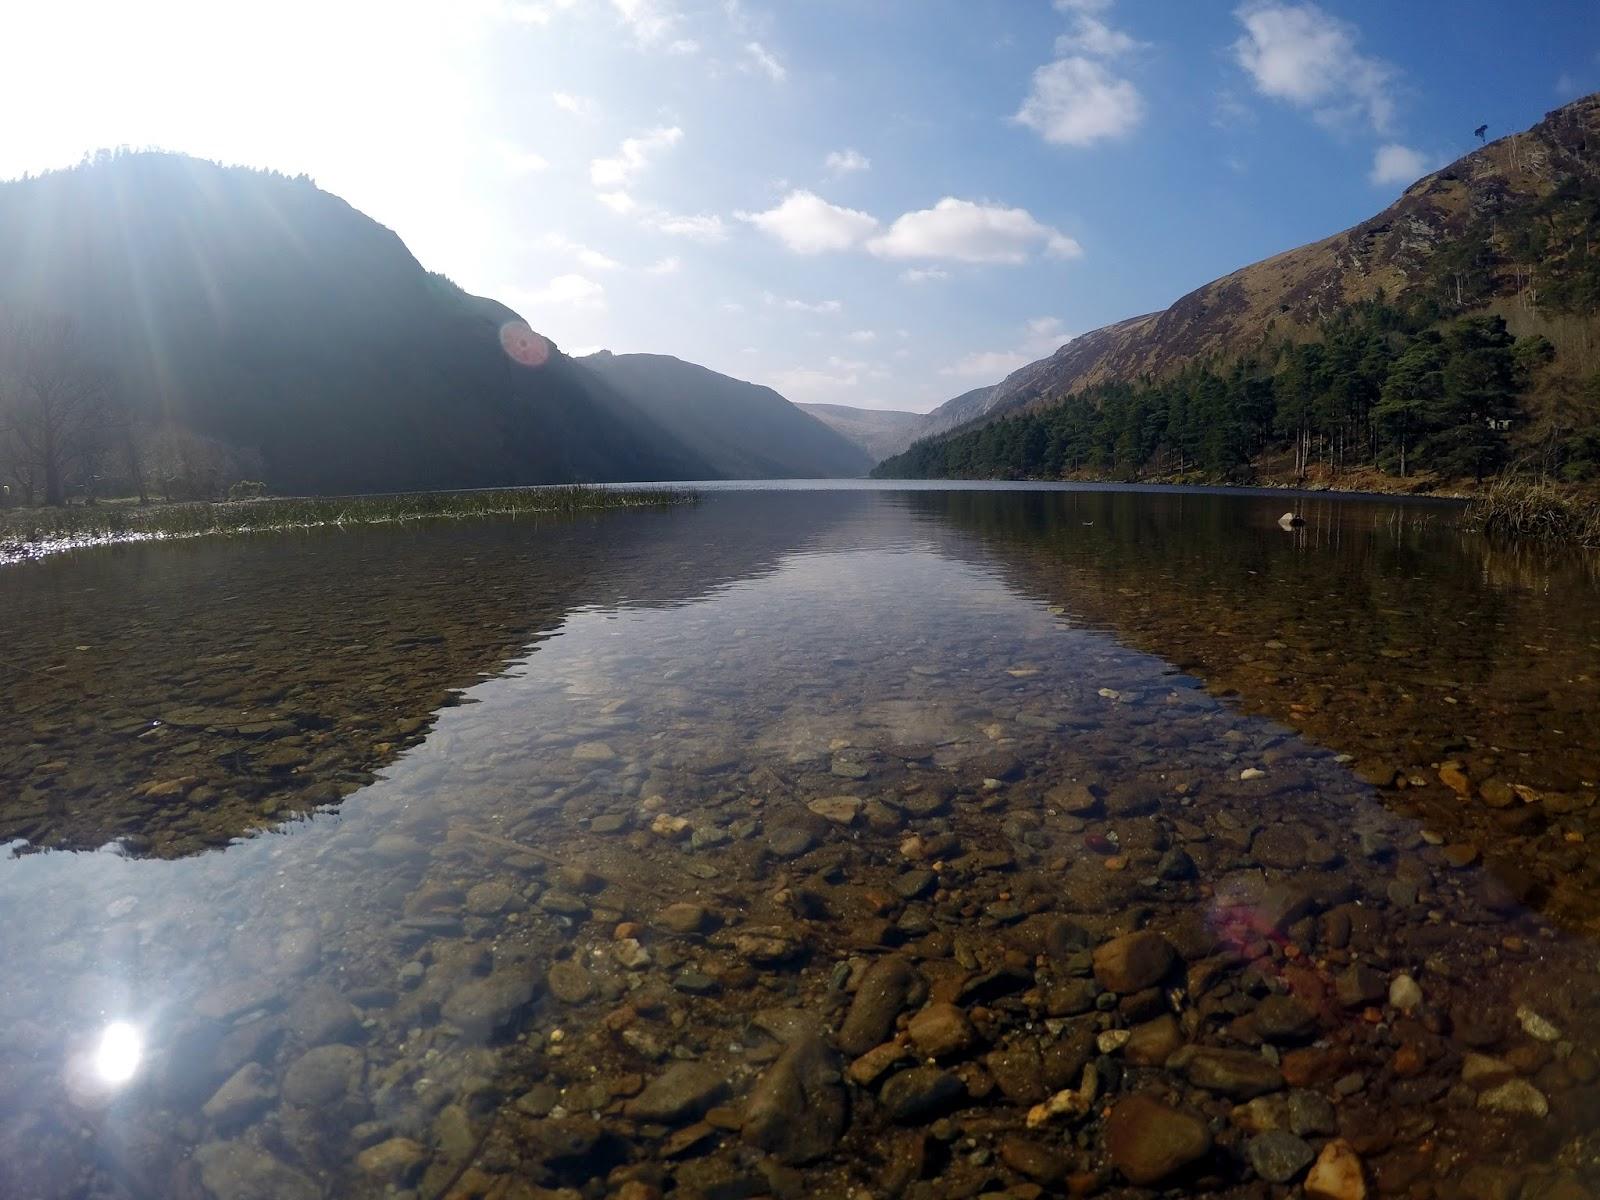 Wicklow mountains, Lough Tay, Guinness lake, tours, explore, Ireland, Dublin countryside, trip from Dublin, Glendalough,